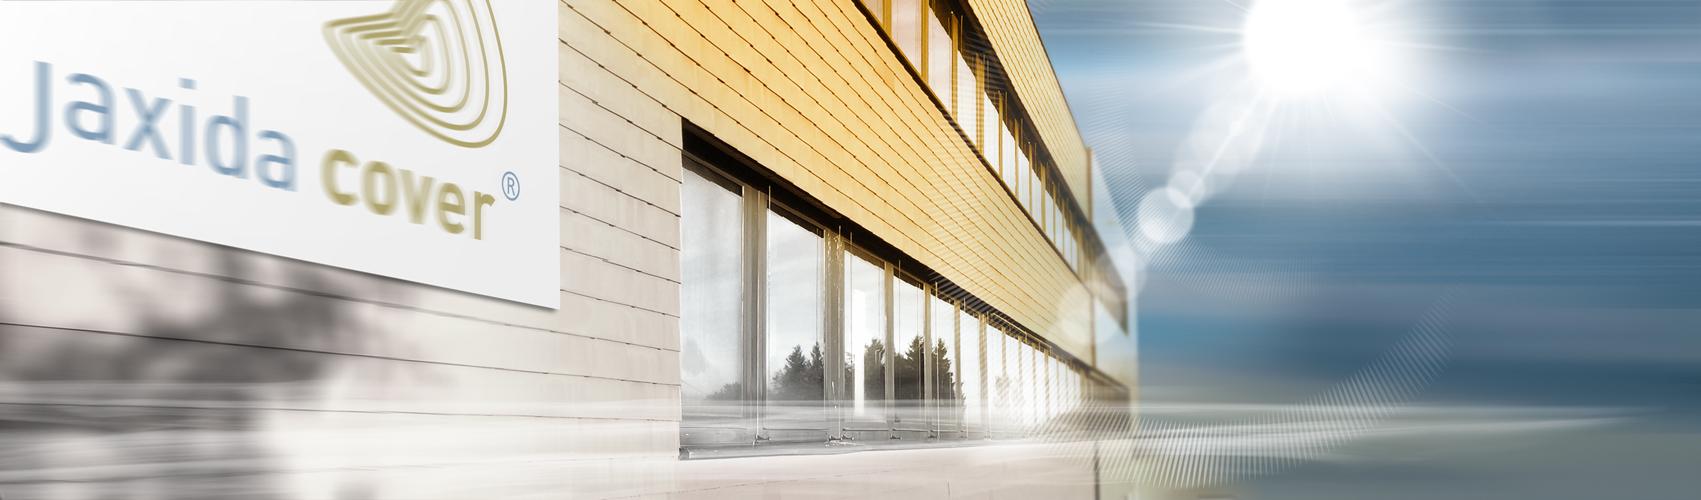 Jaxida Cover - Firma - Unternehmen